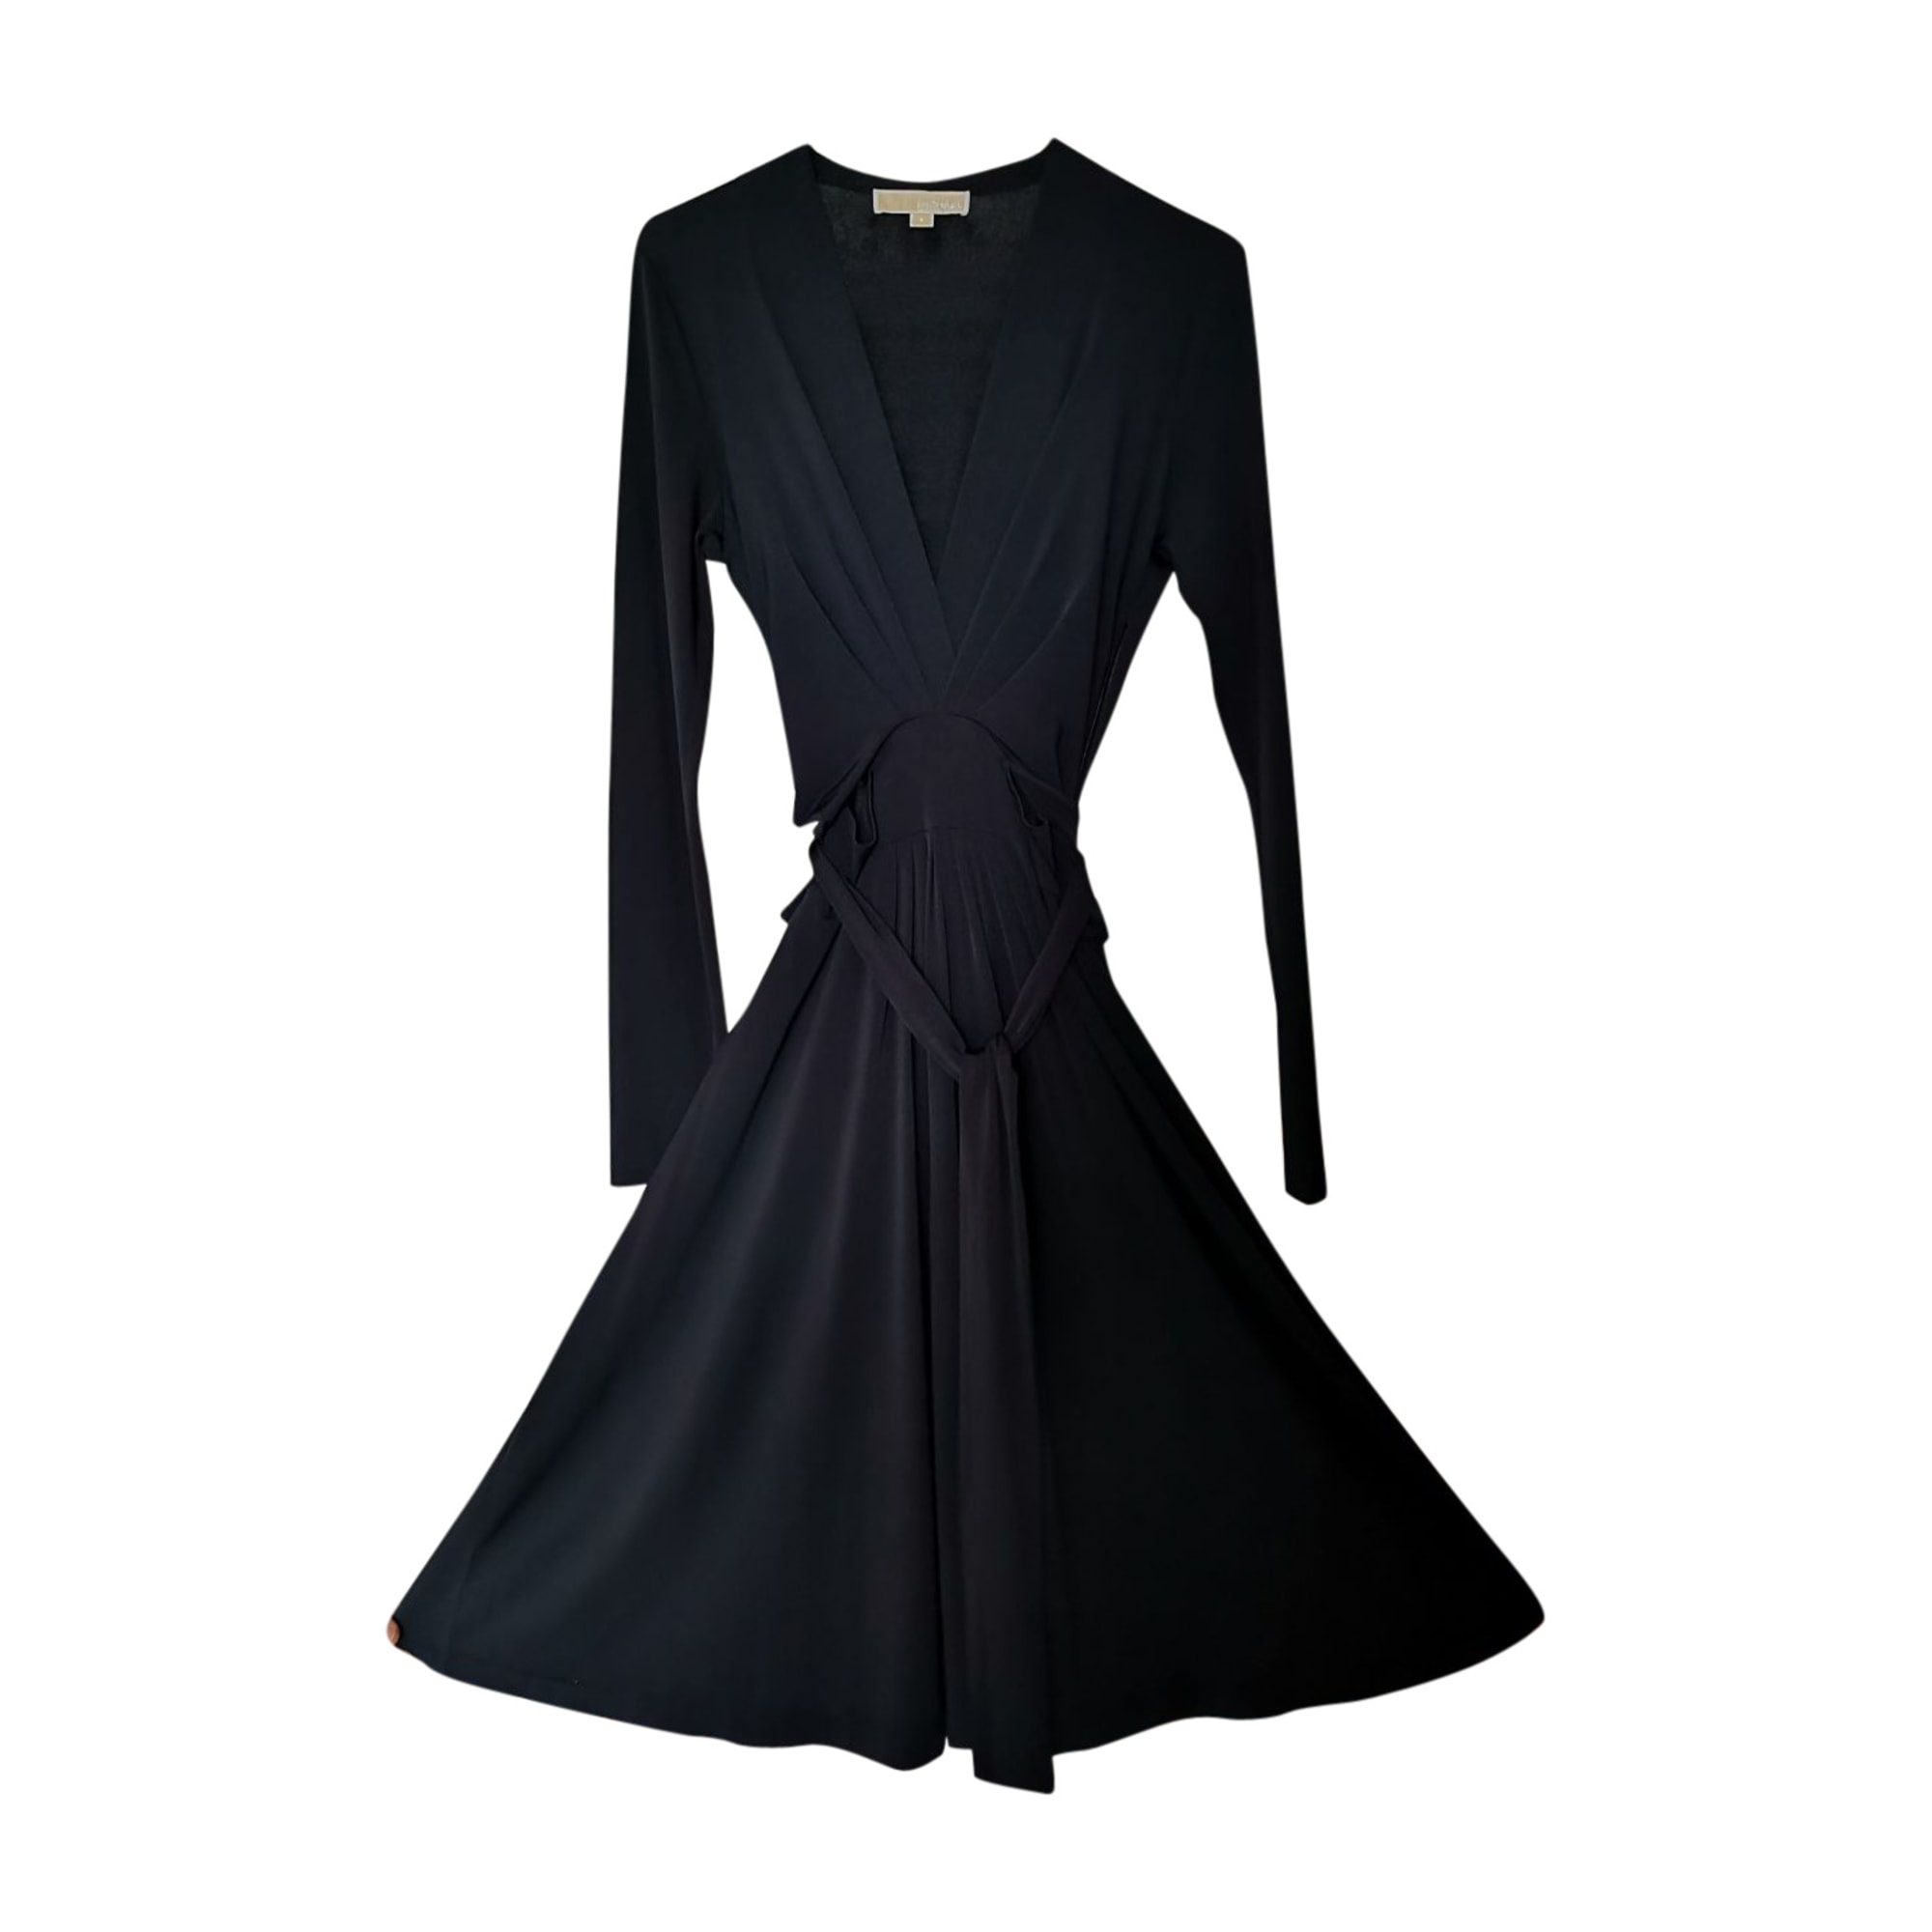 Midi Dress MICHAEL KORS Black